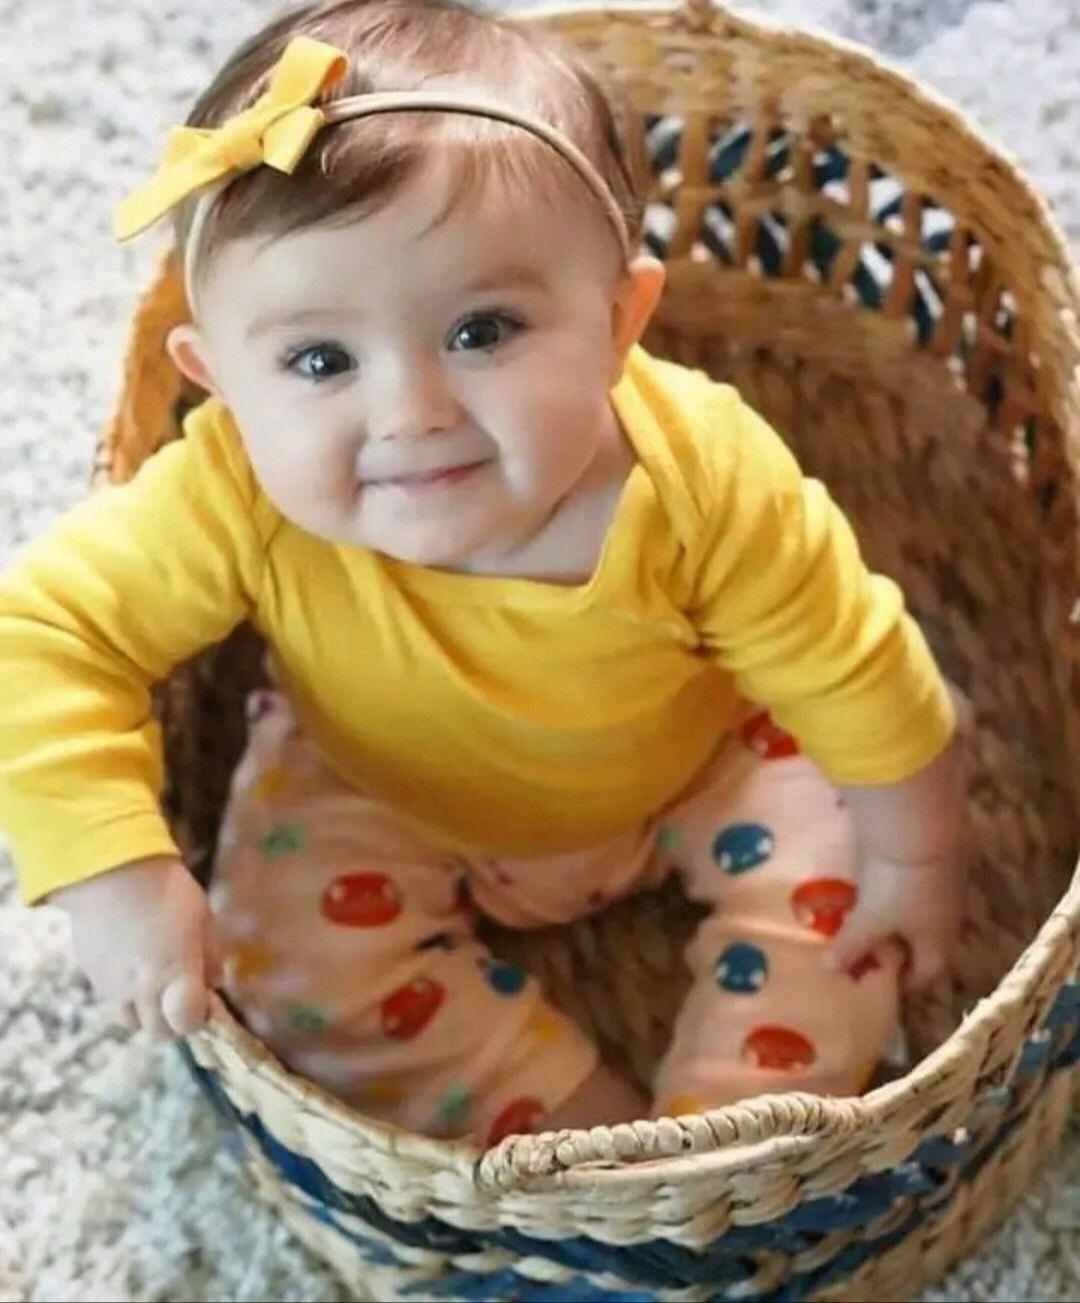 Nilofark07 Cute Baby Boy Photos Cute Kids Pics Cute Baby Boy Images